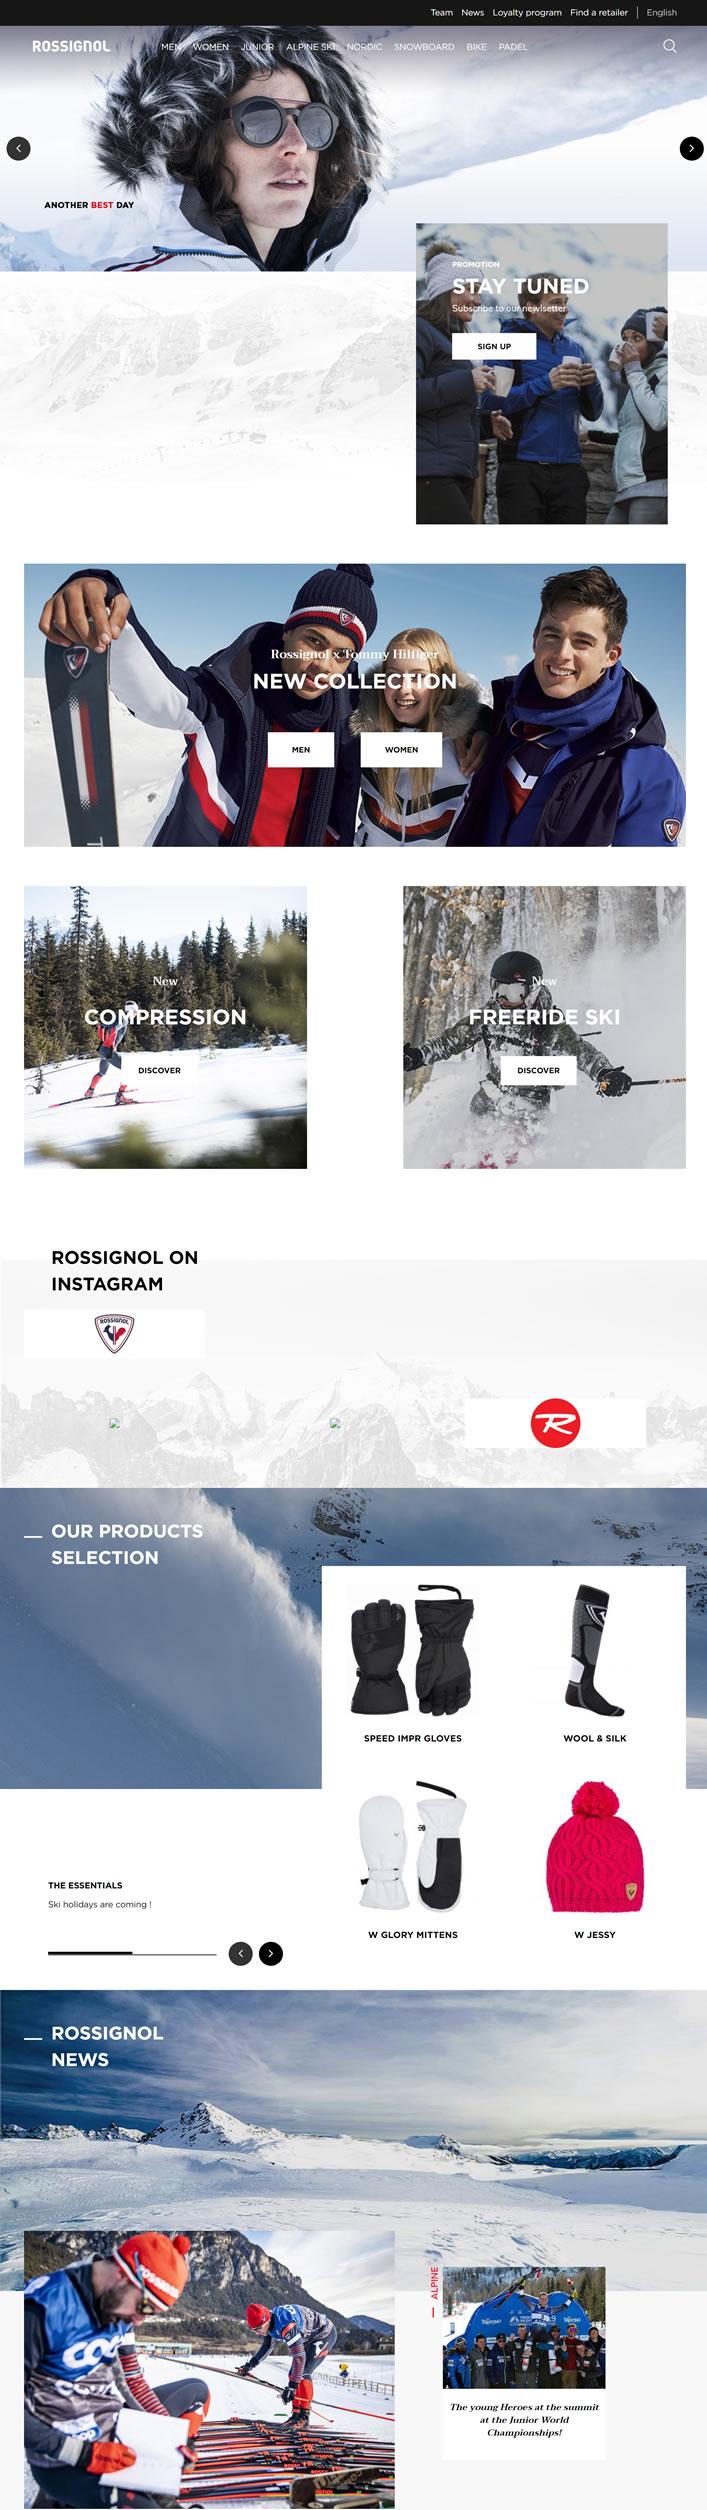 Rossignol金鸡美国官网:始于1907年法国百年雪具品牌